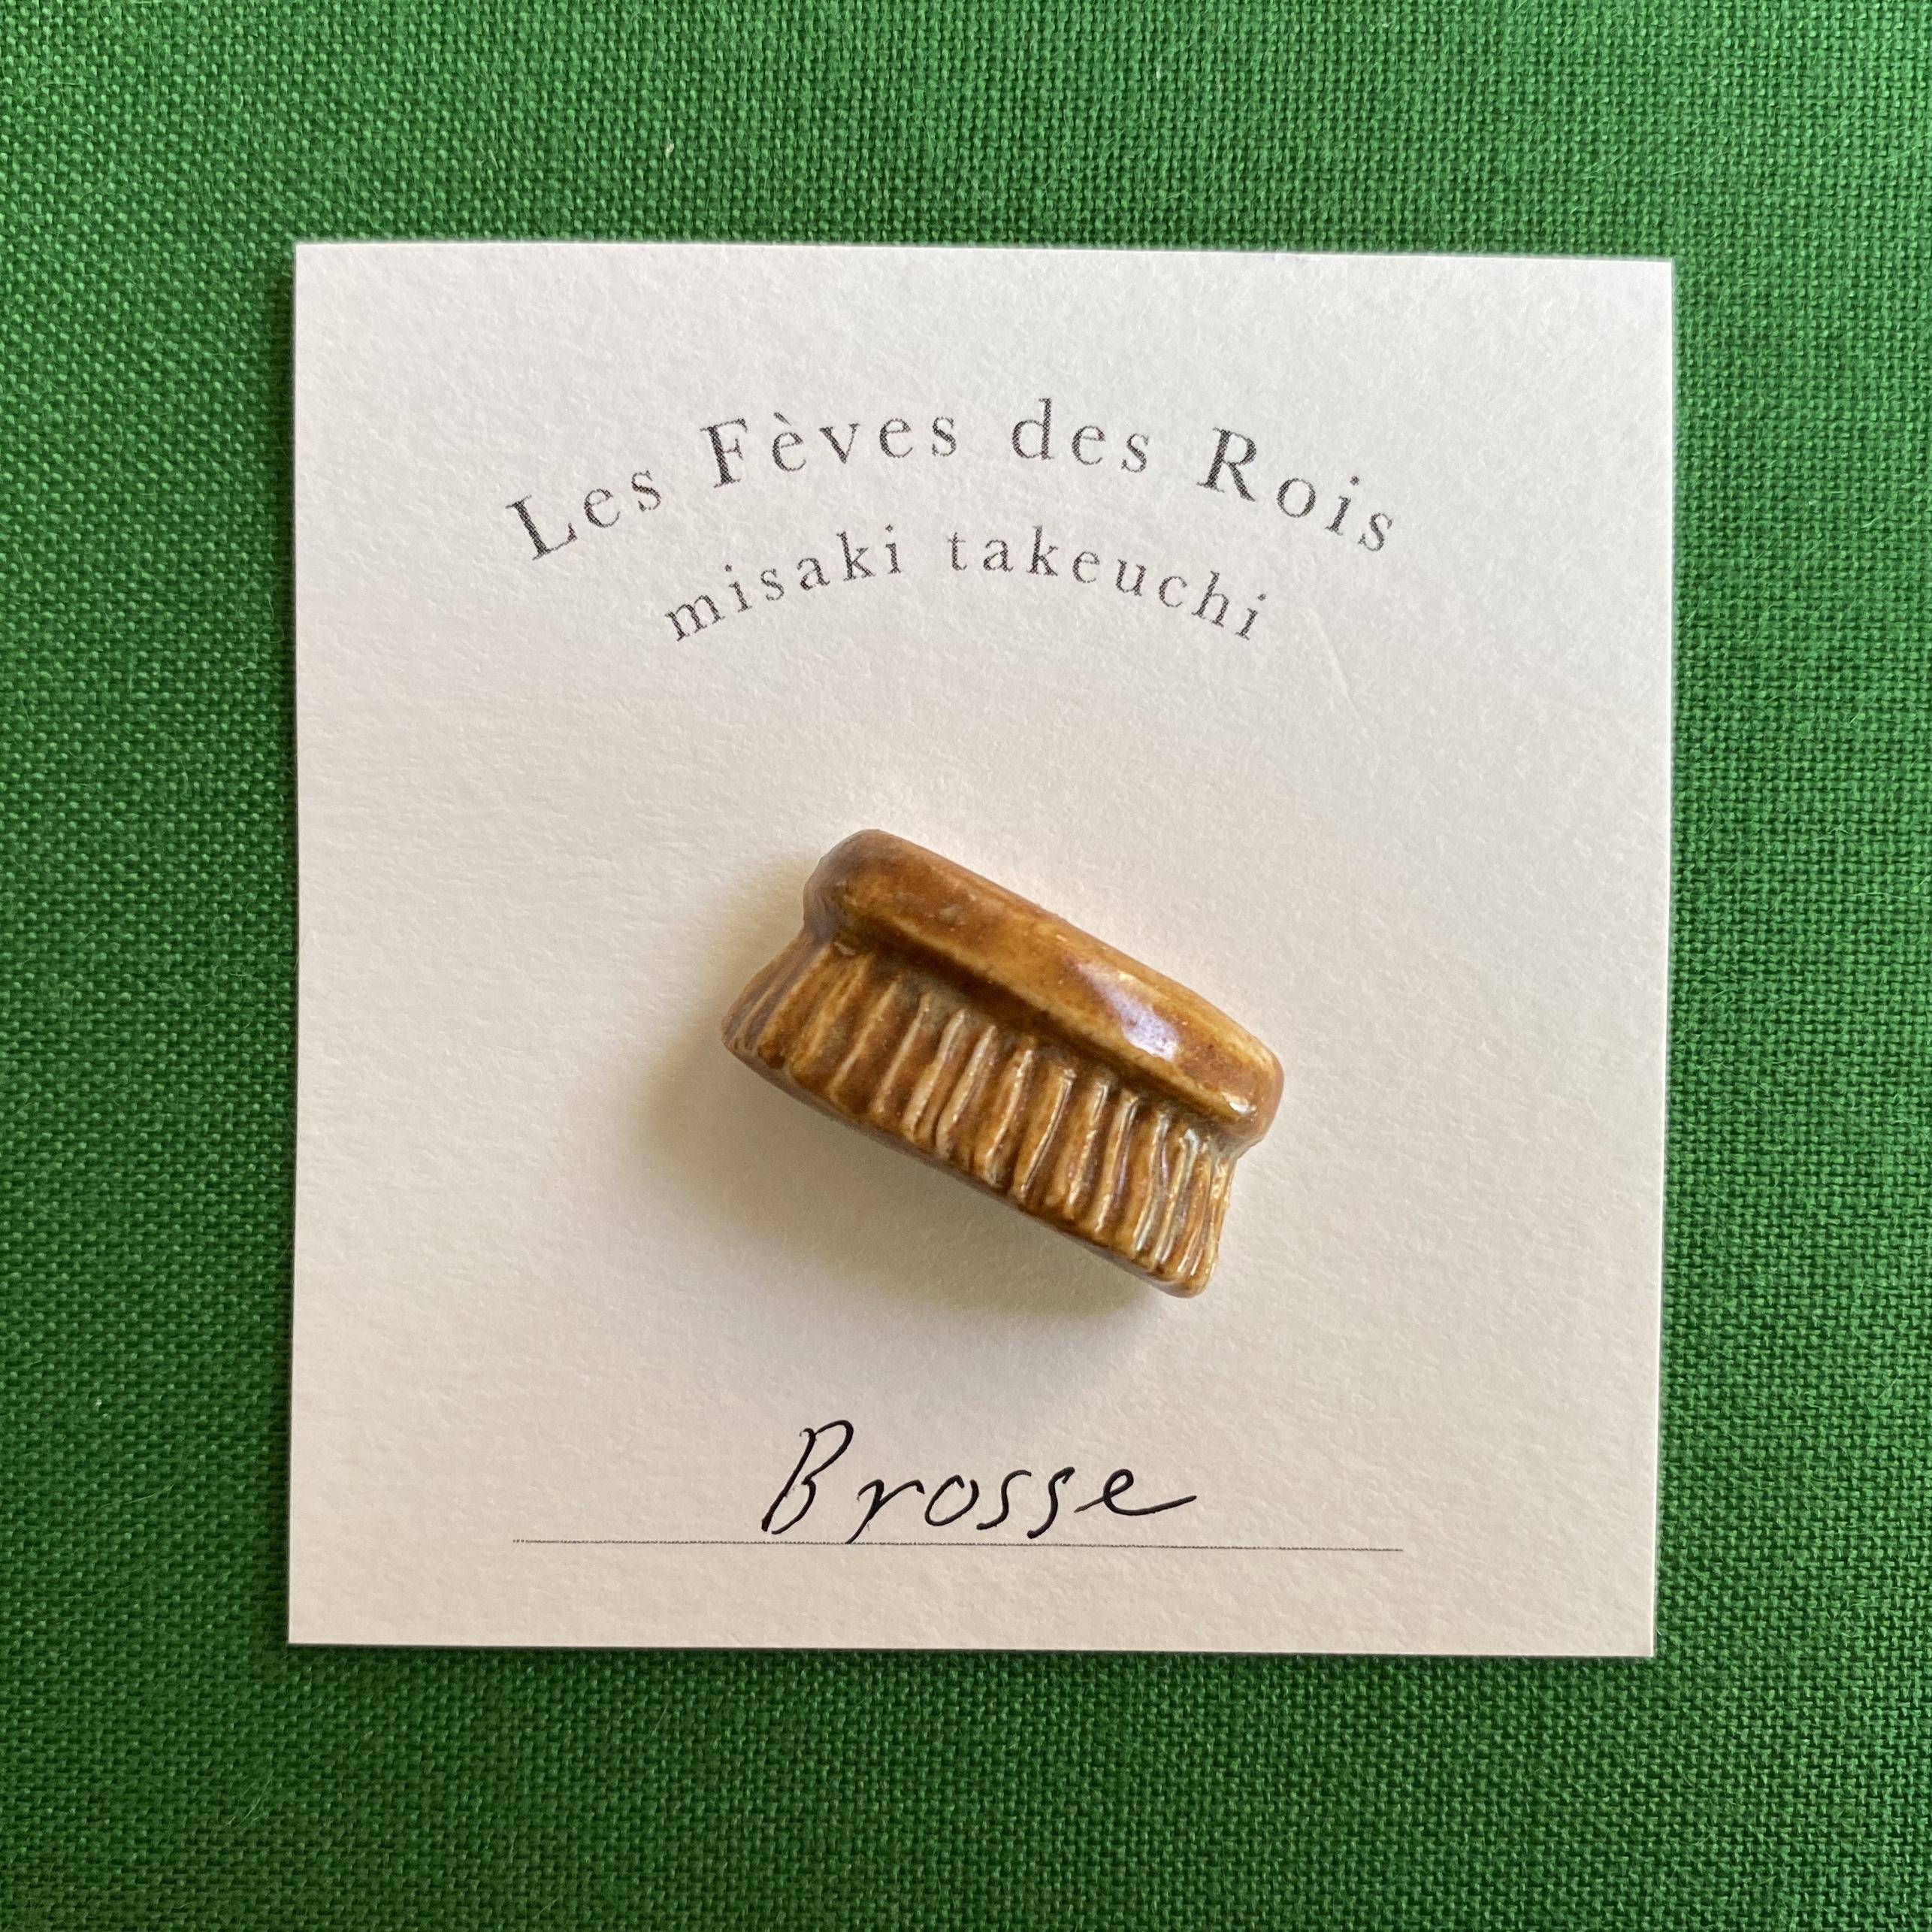 brosse(ブラシ)misaki takeuchi ハンドメイドフェーヴ/mt007